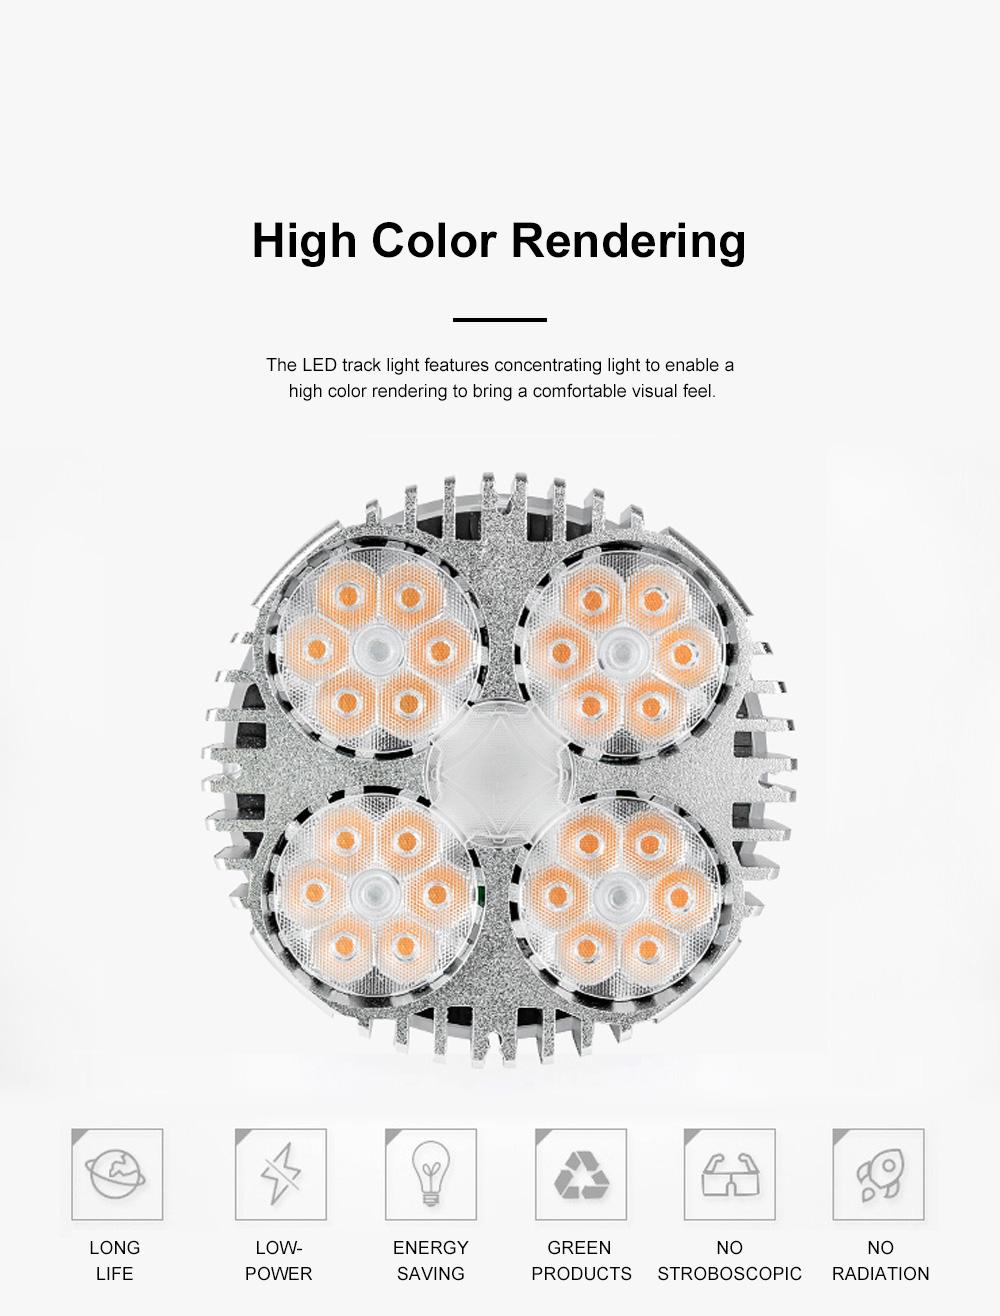 PAR30 Ultra-bright LED Track Lighting for Clothing Store Art Gallery Warm Light LED Track Lamp Free Rotation Lazy Arm Tracking Spotlight 4